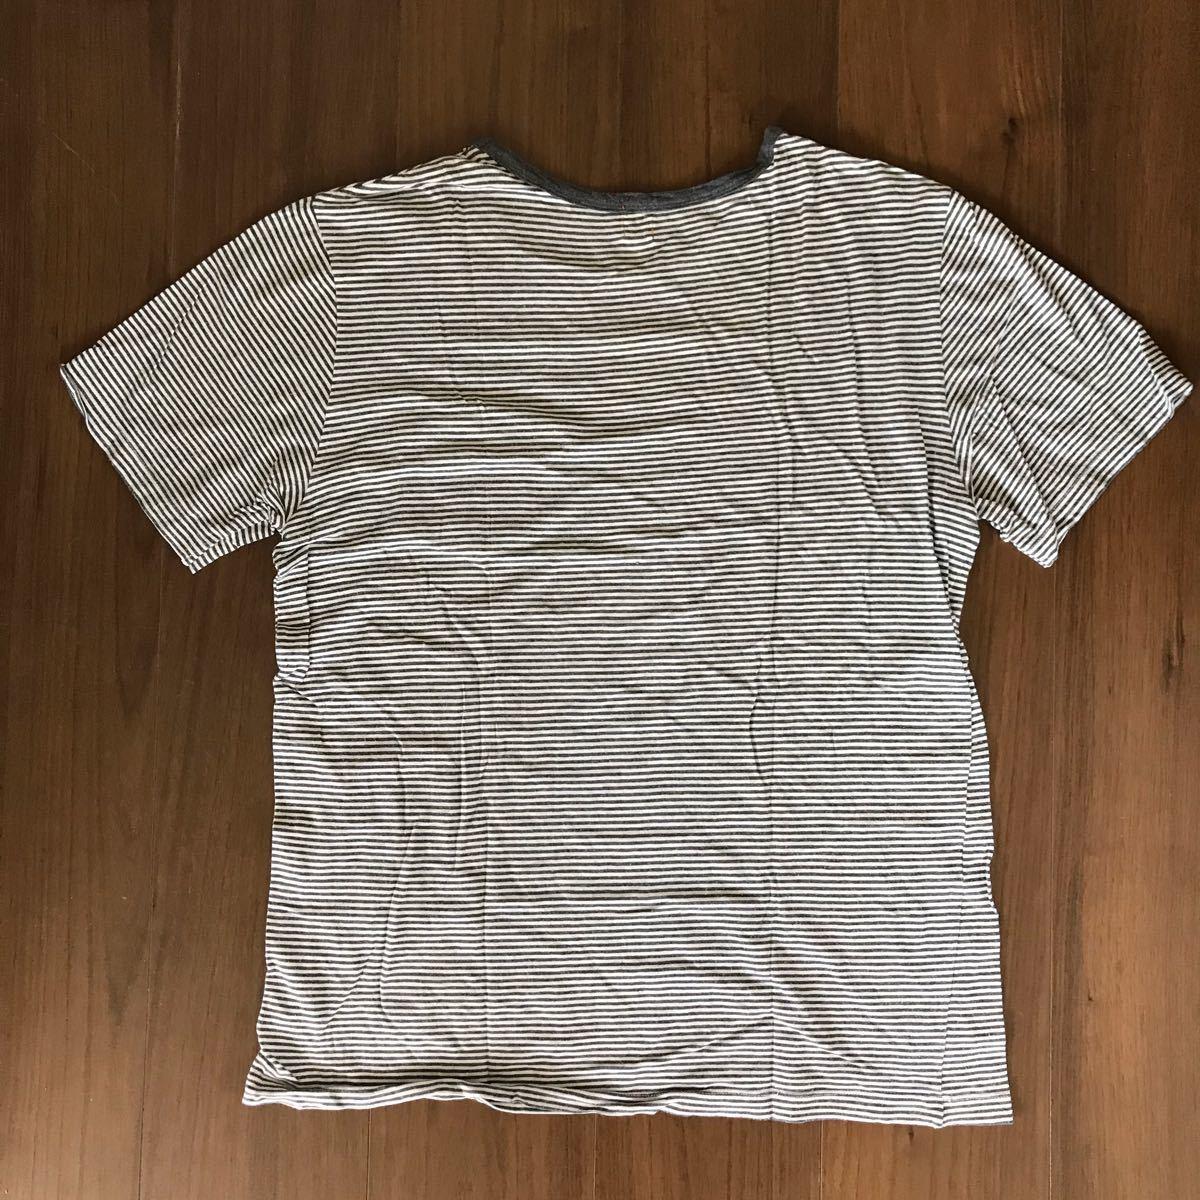 Cher ポケットT ボーダーTシャツ 半袖Tシャツ